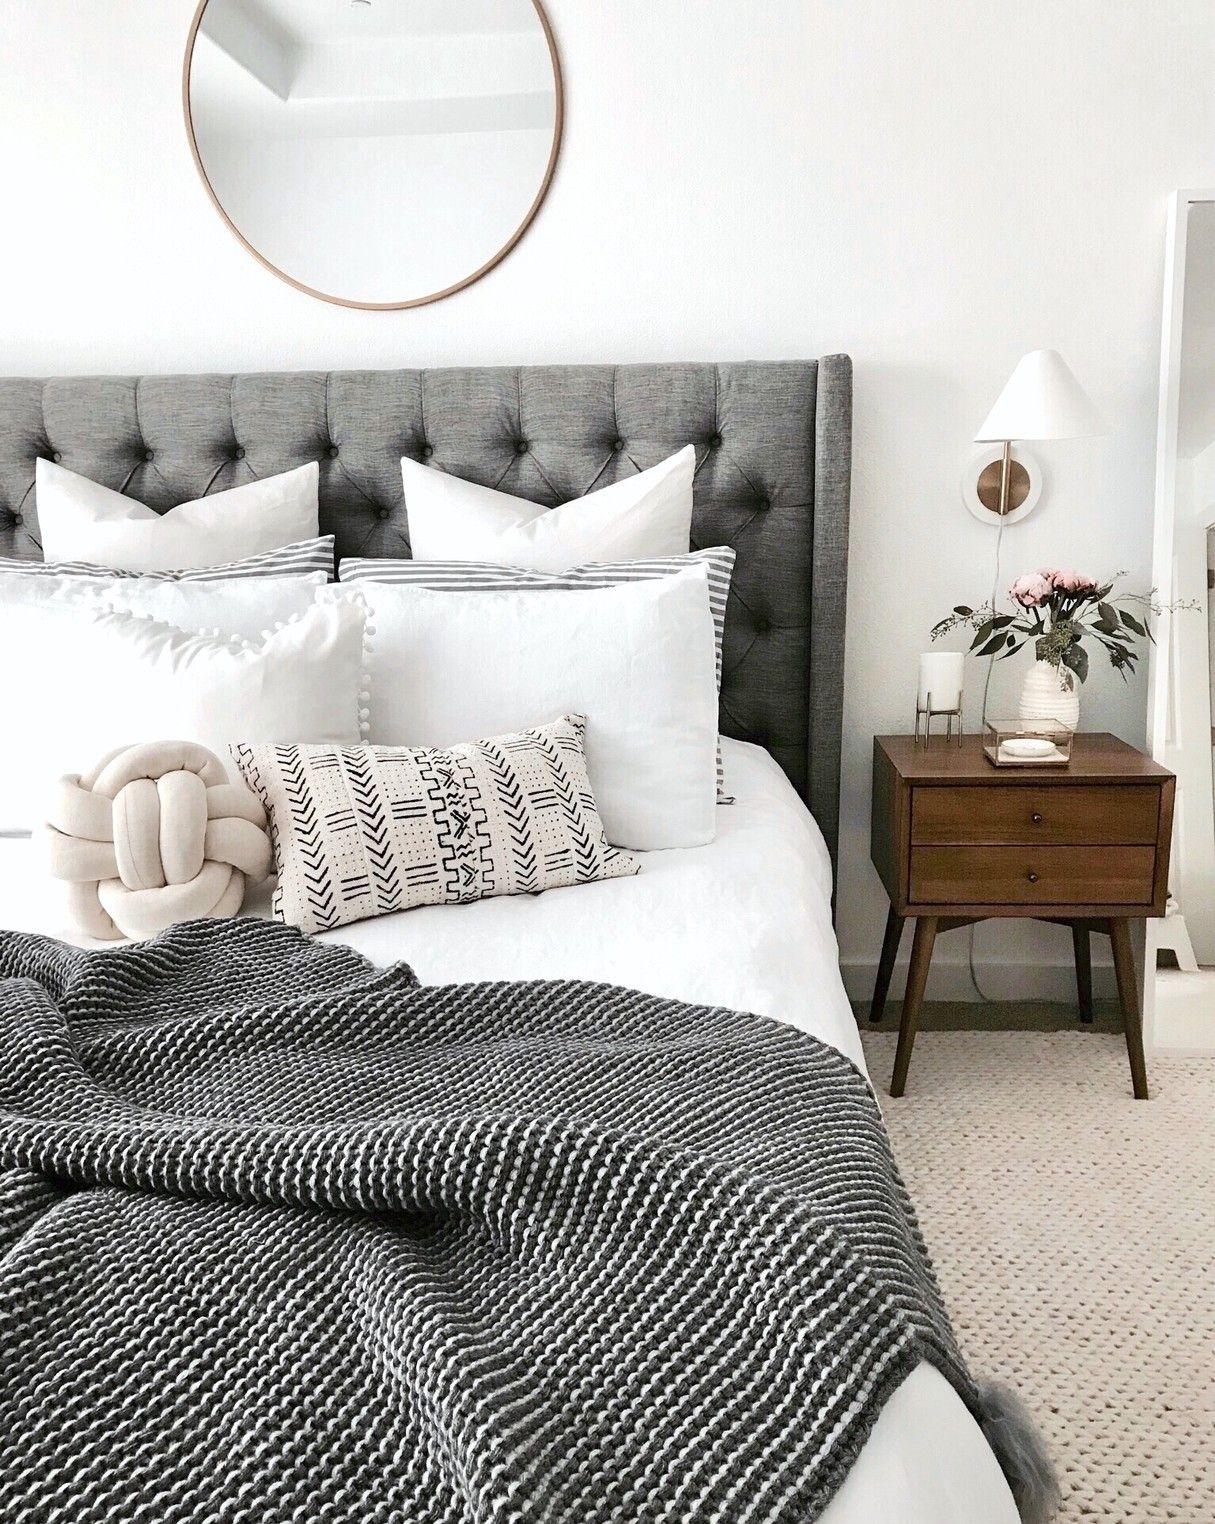 pin by kelli albert on home in 2018 pinterest bedroom rh pinterest com